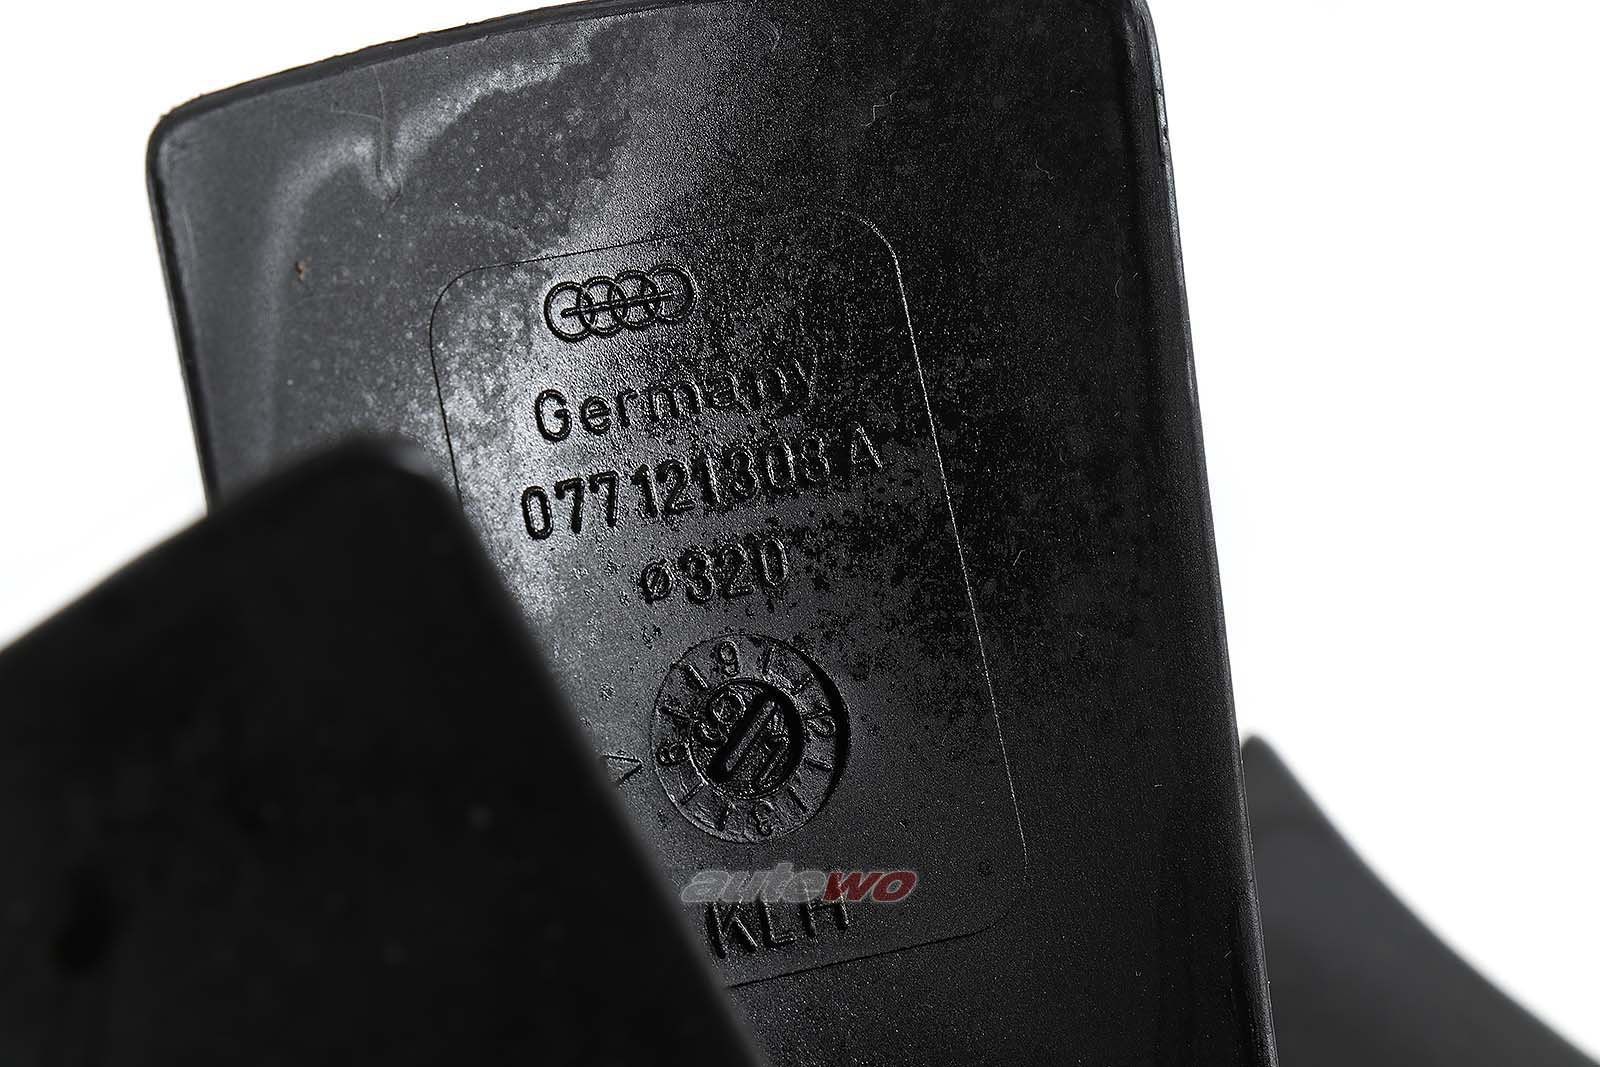 077121303A Audi V8 D11/S4&S6/S6+ C4 3.6-4.2l Elektrolüfterrad